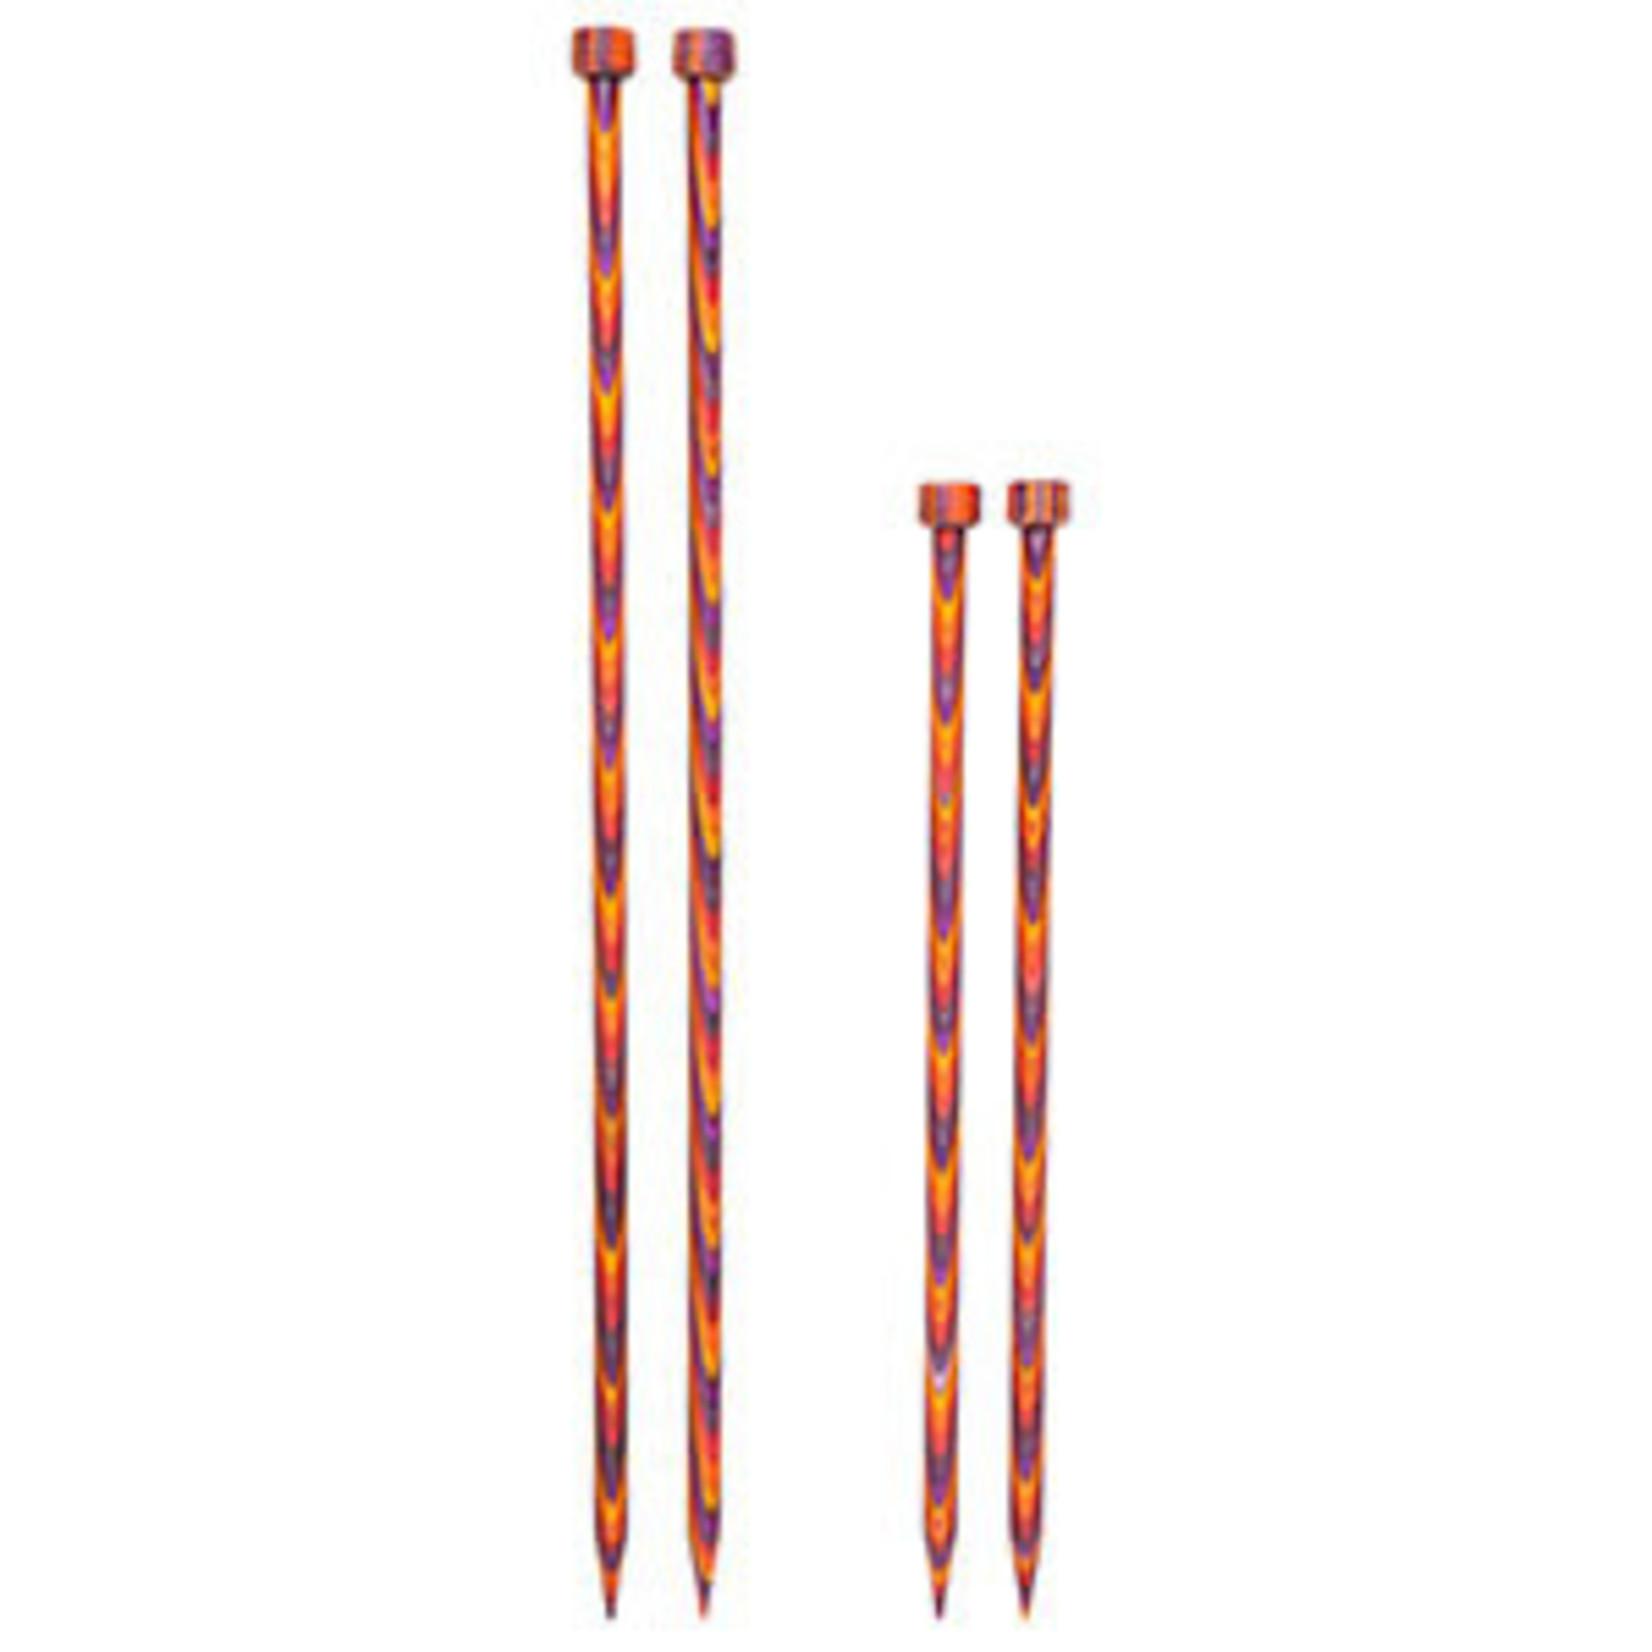 "Knit Picks KNIT PICKS Rainbow Wood Single Point Knitting Needles 35cm (14"")"